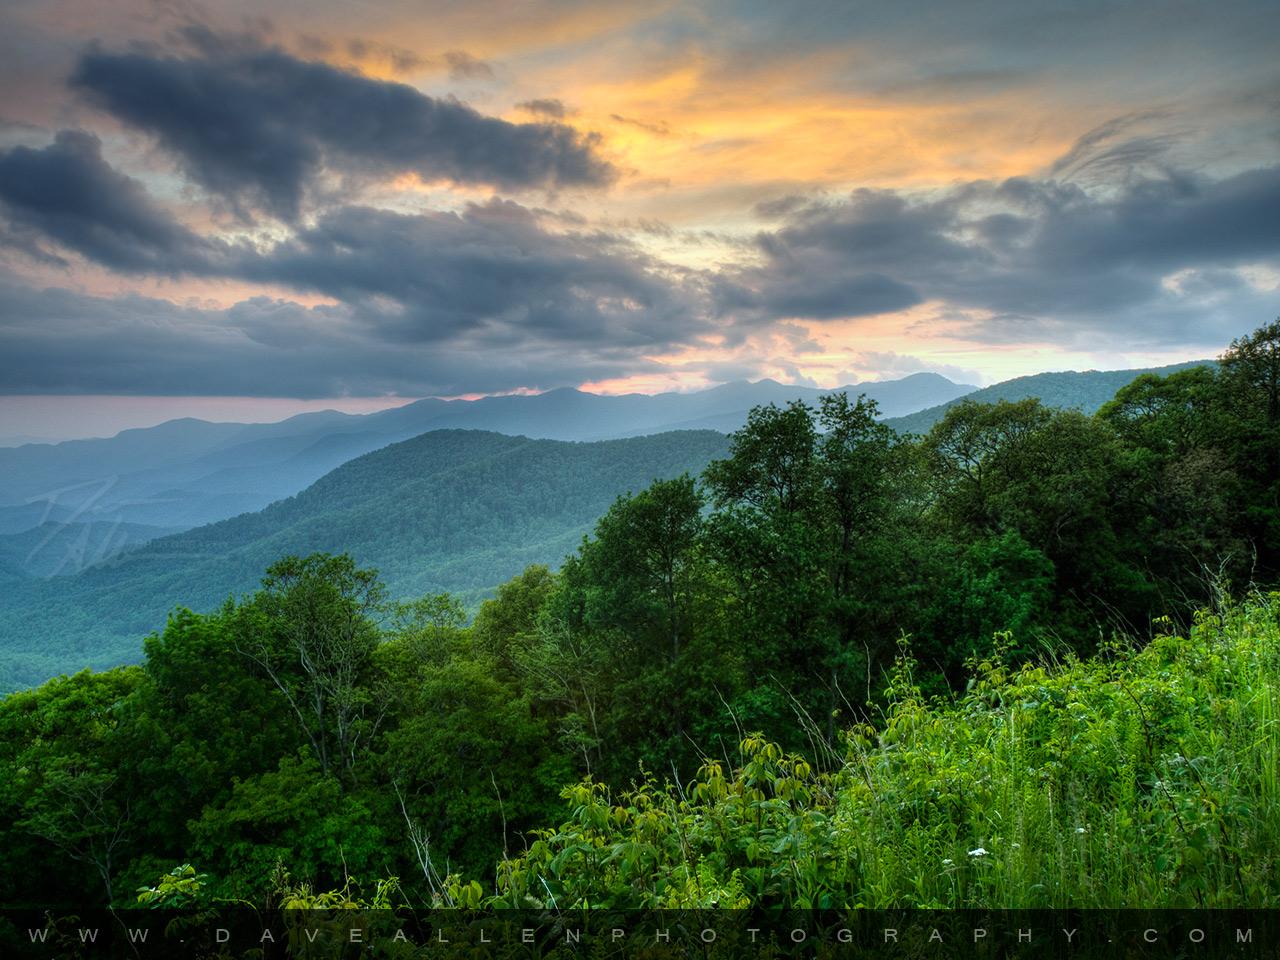 appalachian blue ridge mountains wallpaper - photo #2